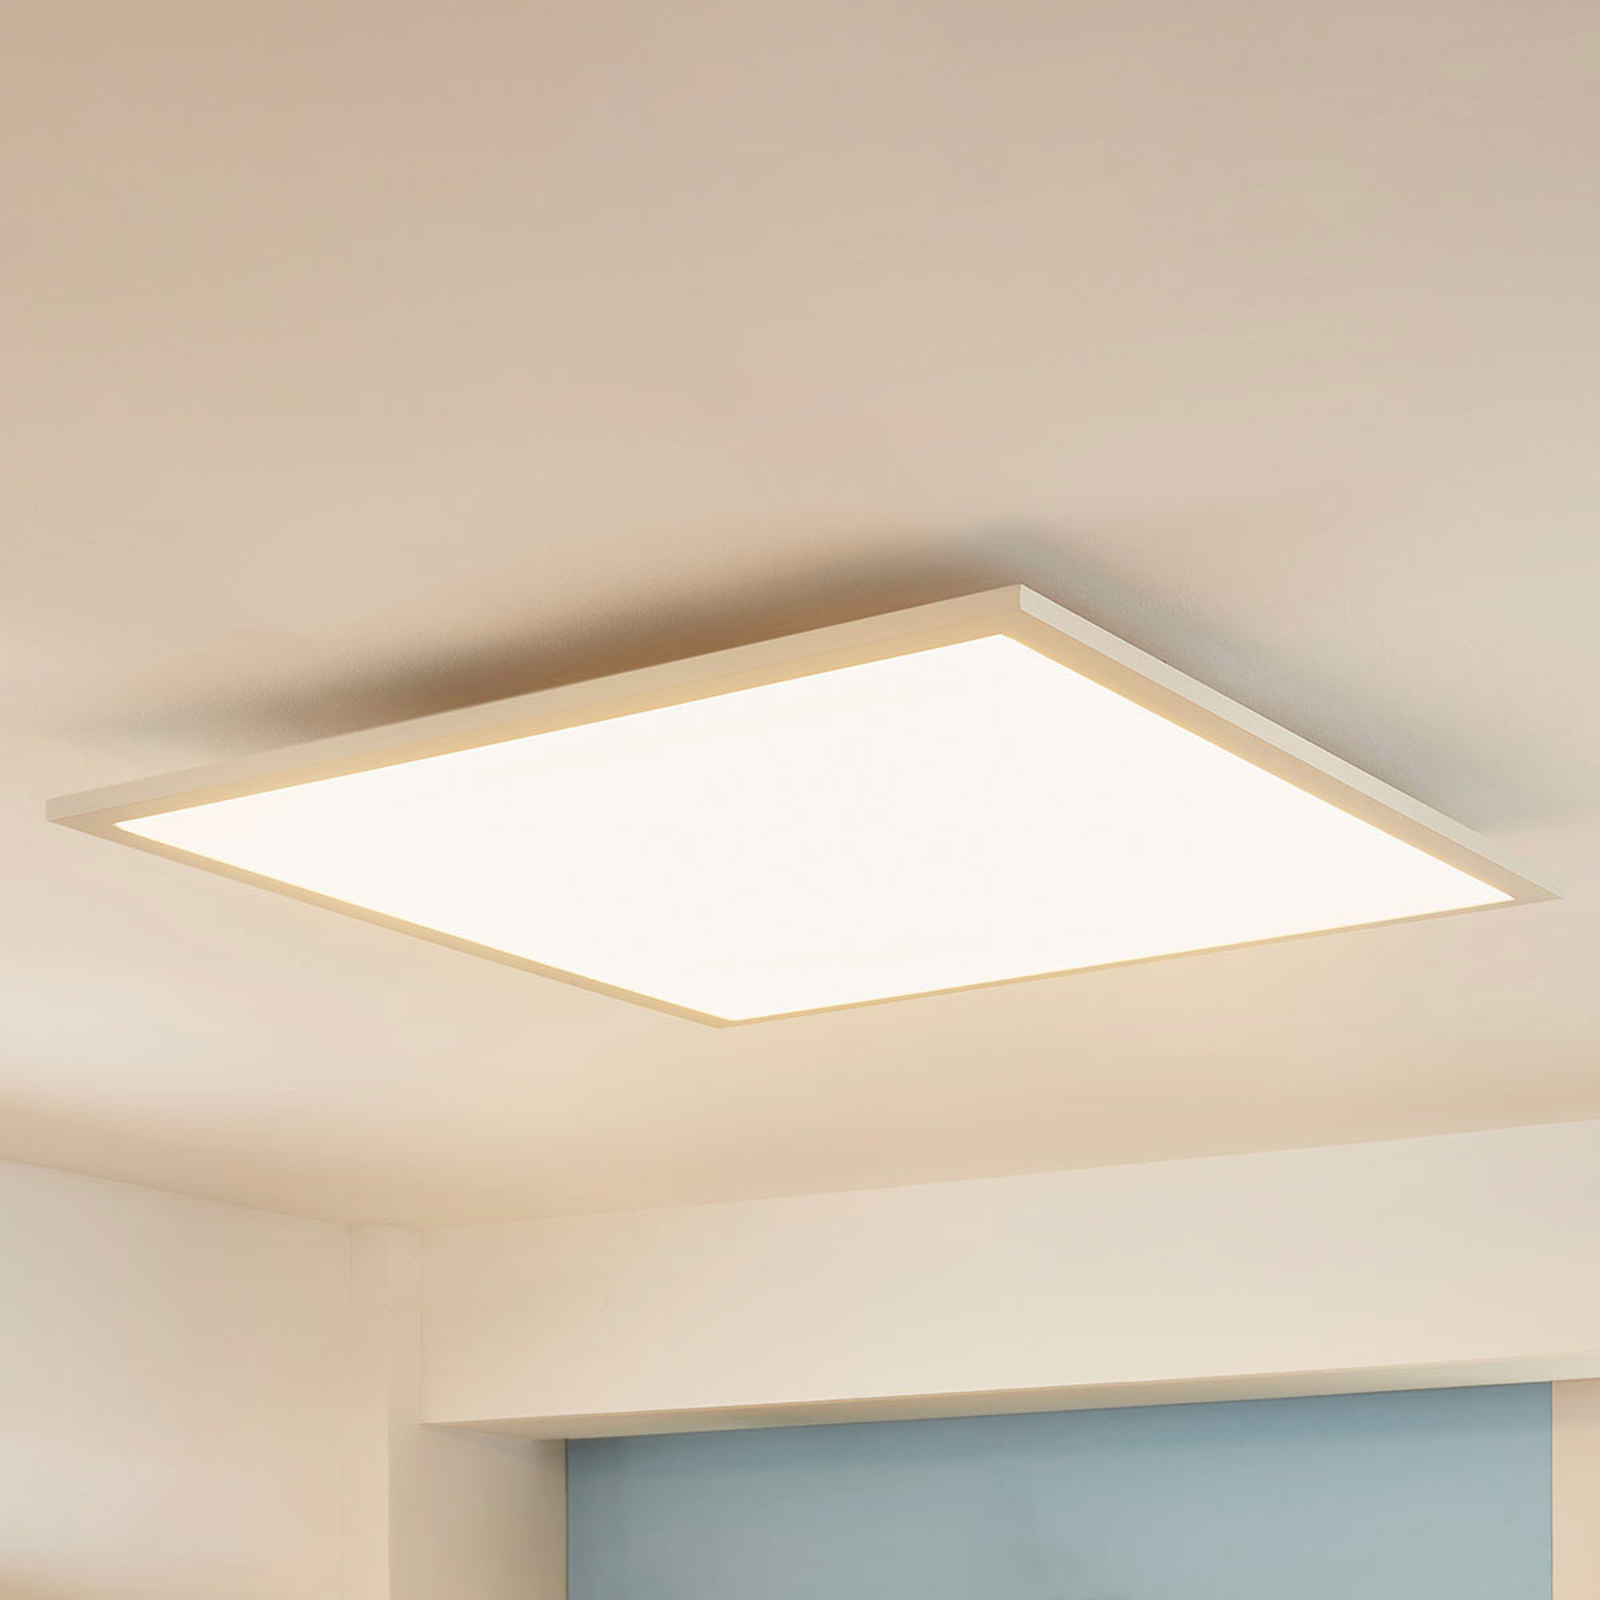 Kvadratisk LED-panel Enja, 62 x 62 cm